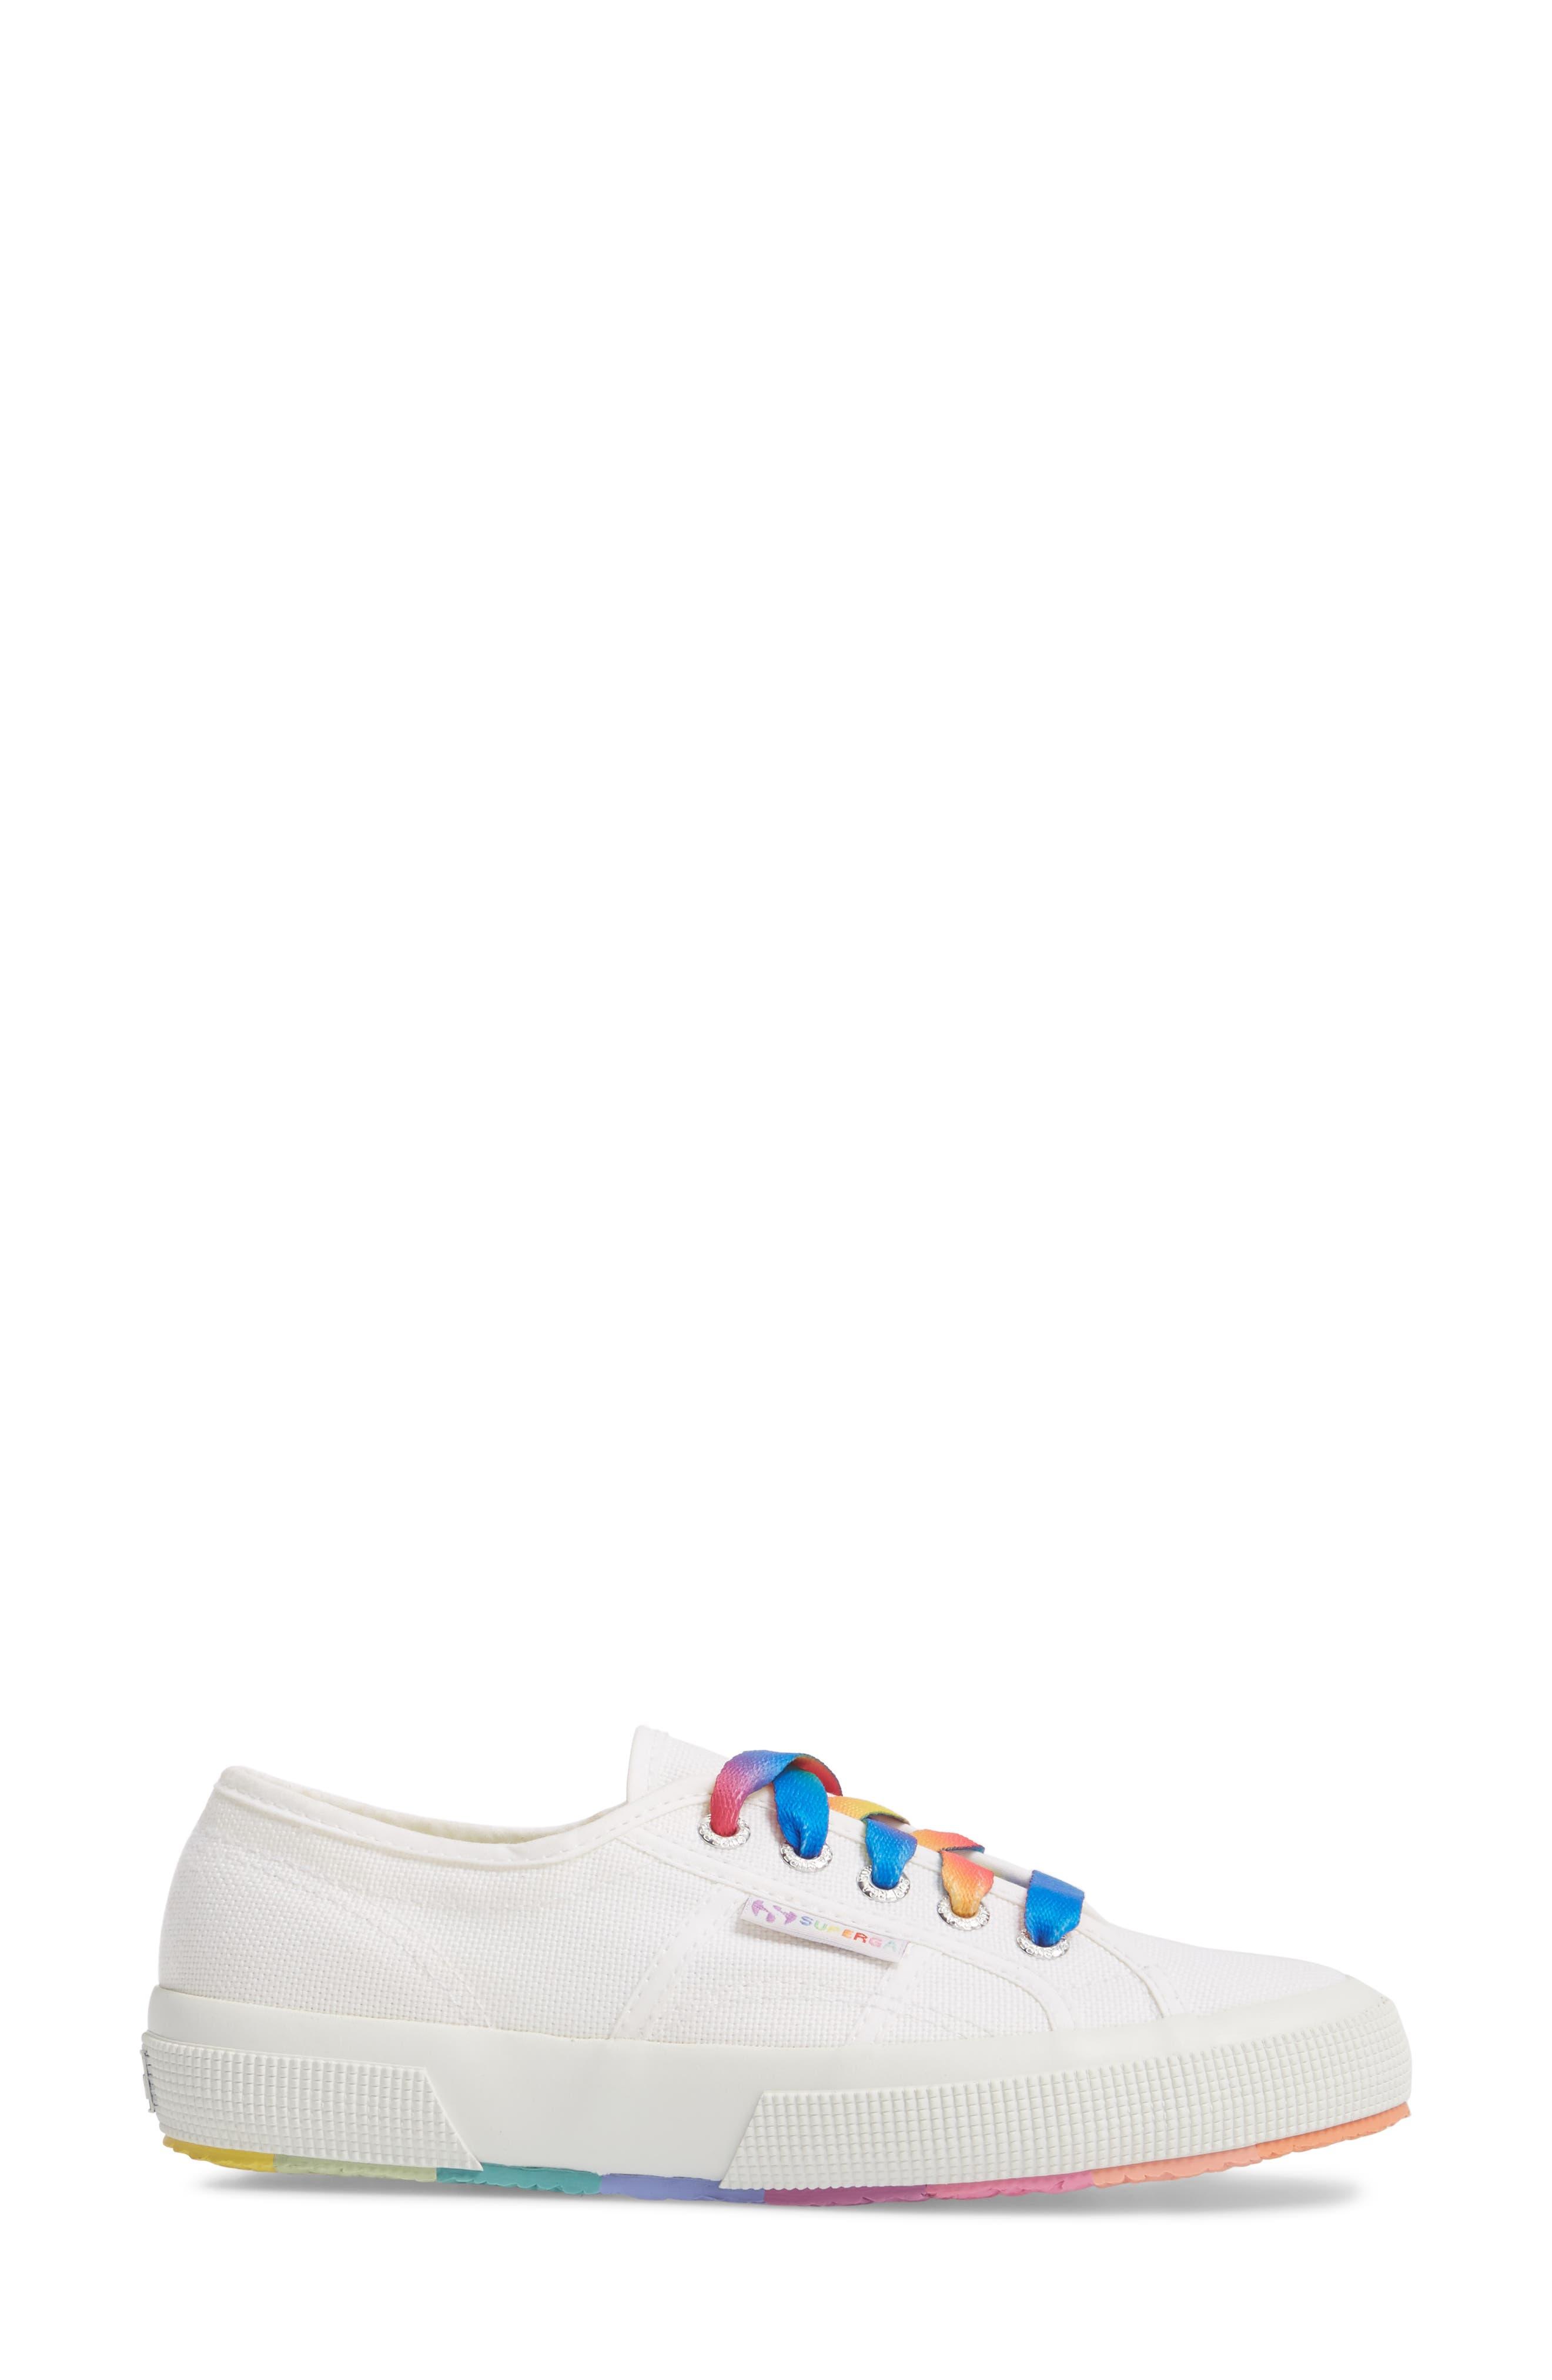 2750 Multicolor Sneaker,                             Alternate thumbnail 3, color,                             White Multi